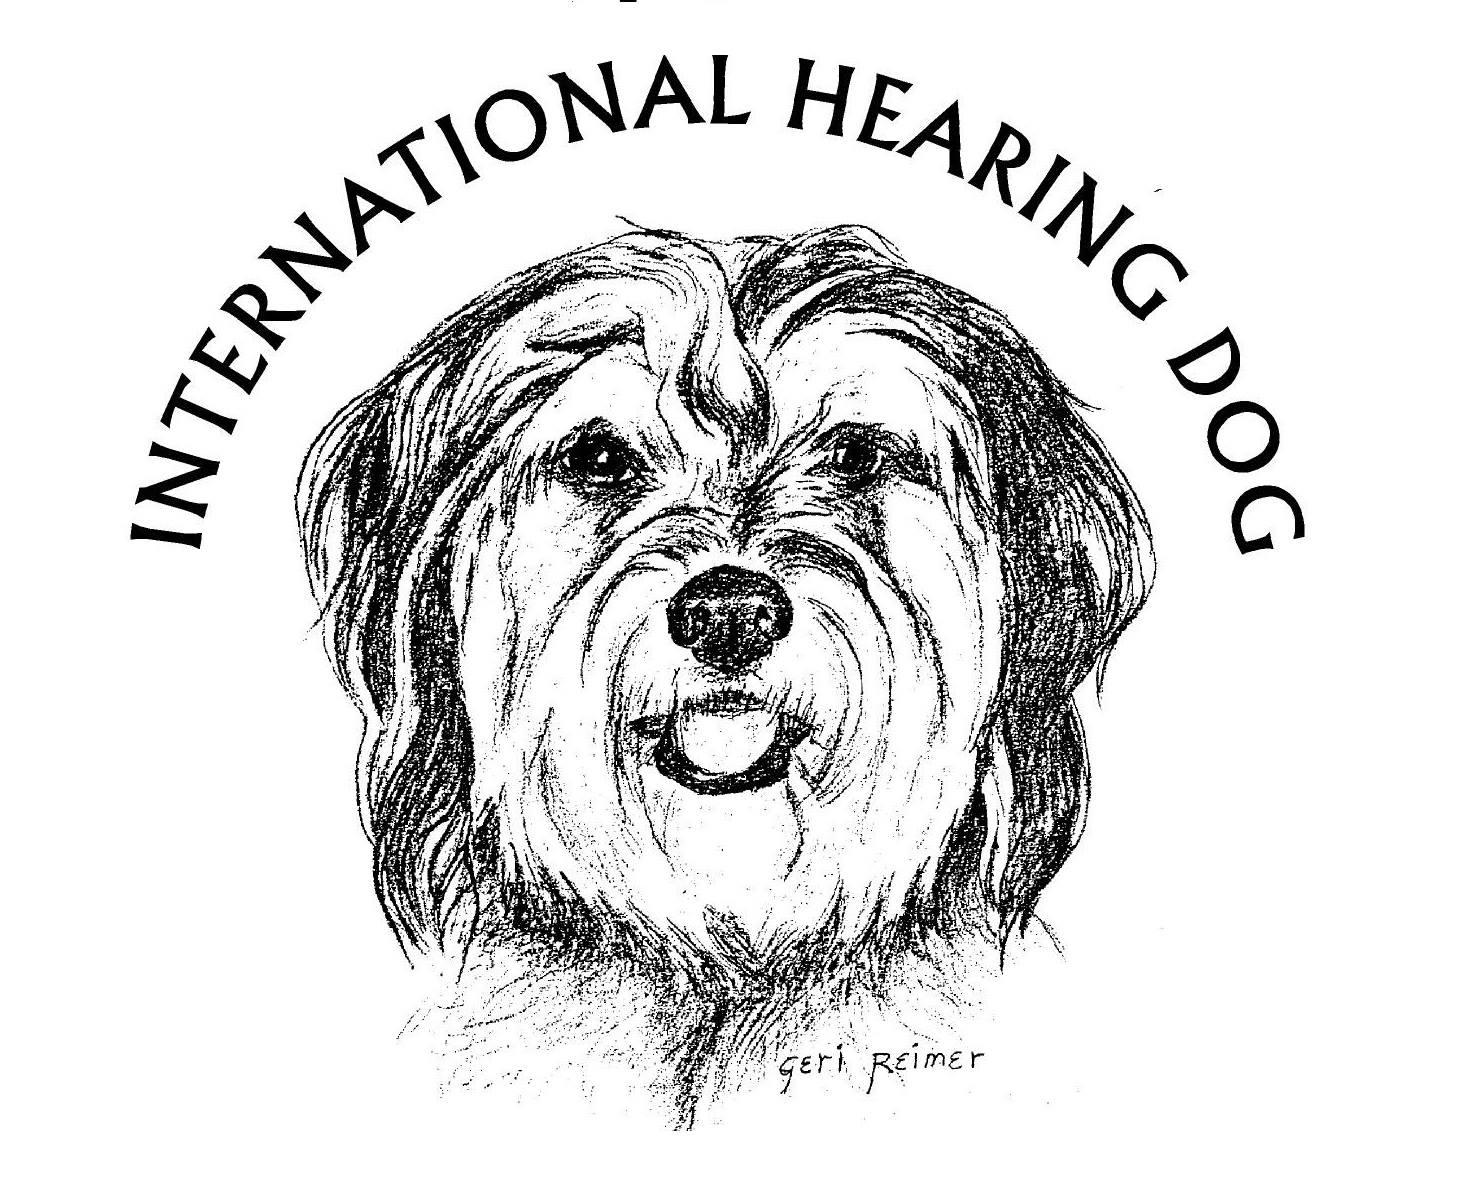 International Hearing Dog, Inc.